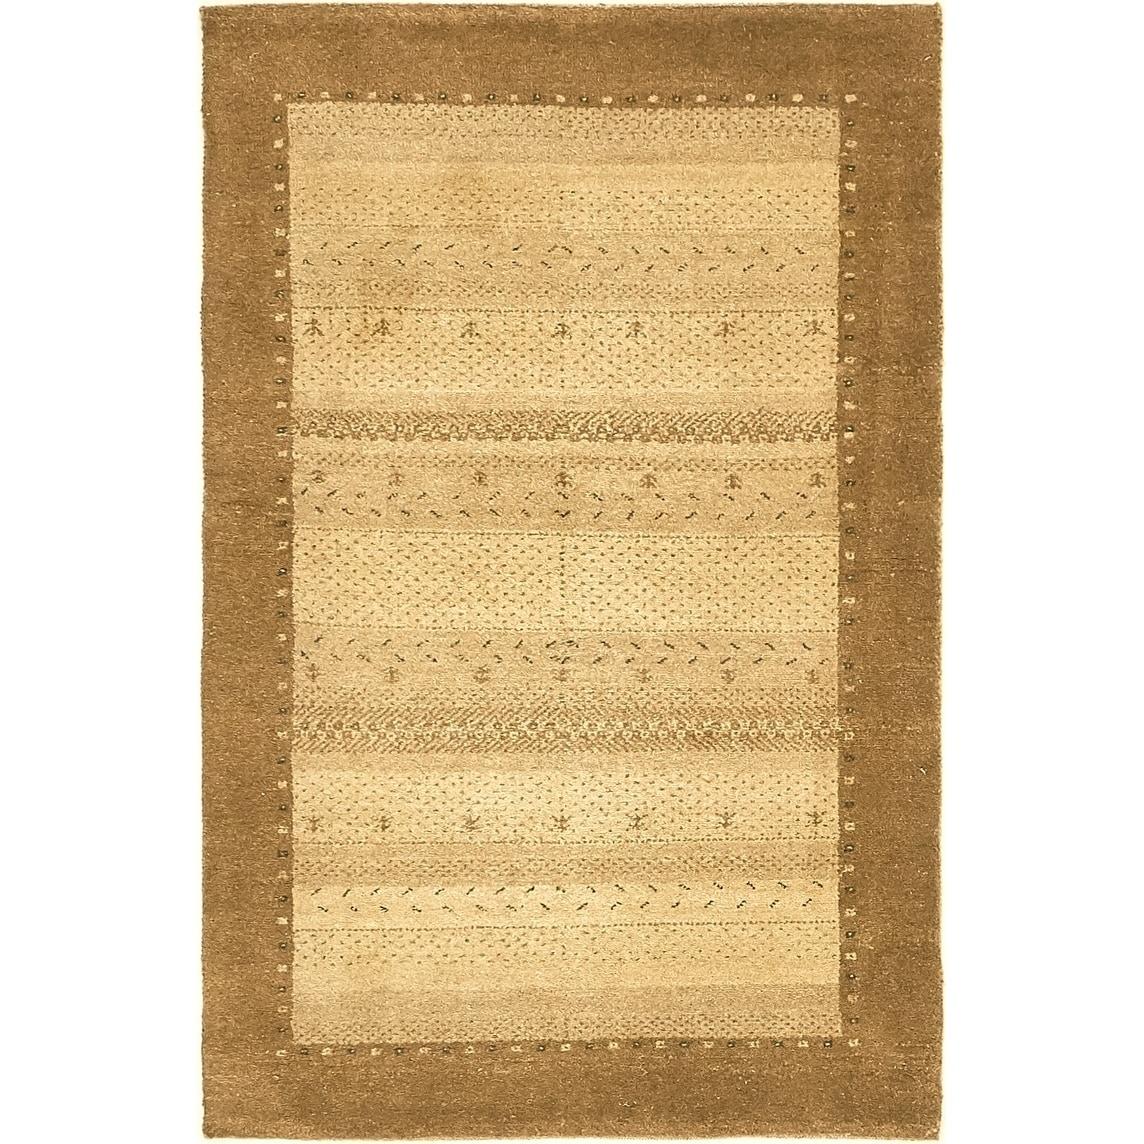 Hand Knotted Kashkuli Gabbeh Wool Area Rug - 3 2 x 5 (Beige - 3 2 x 5)